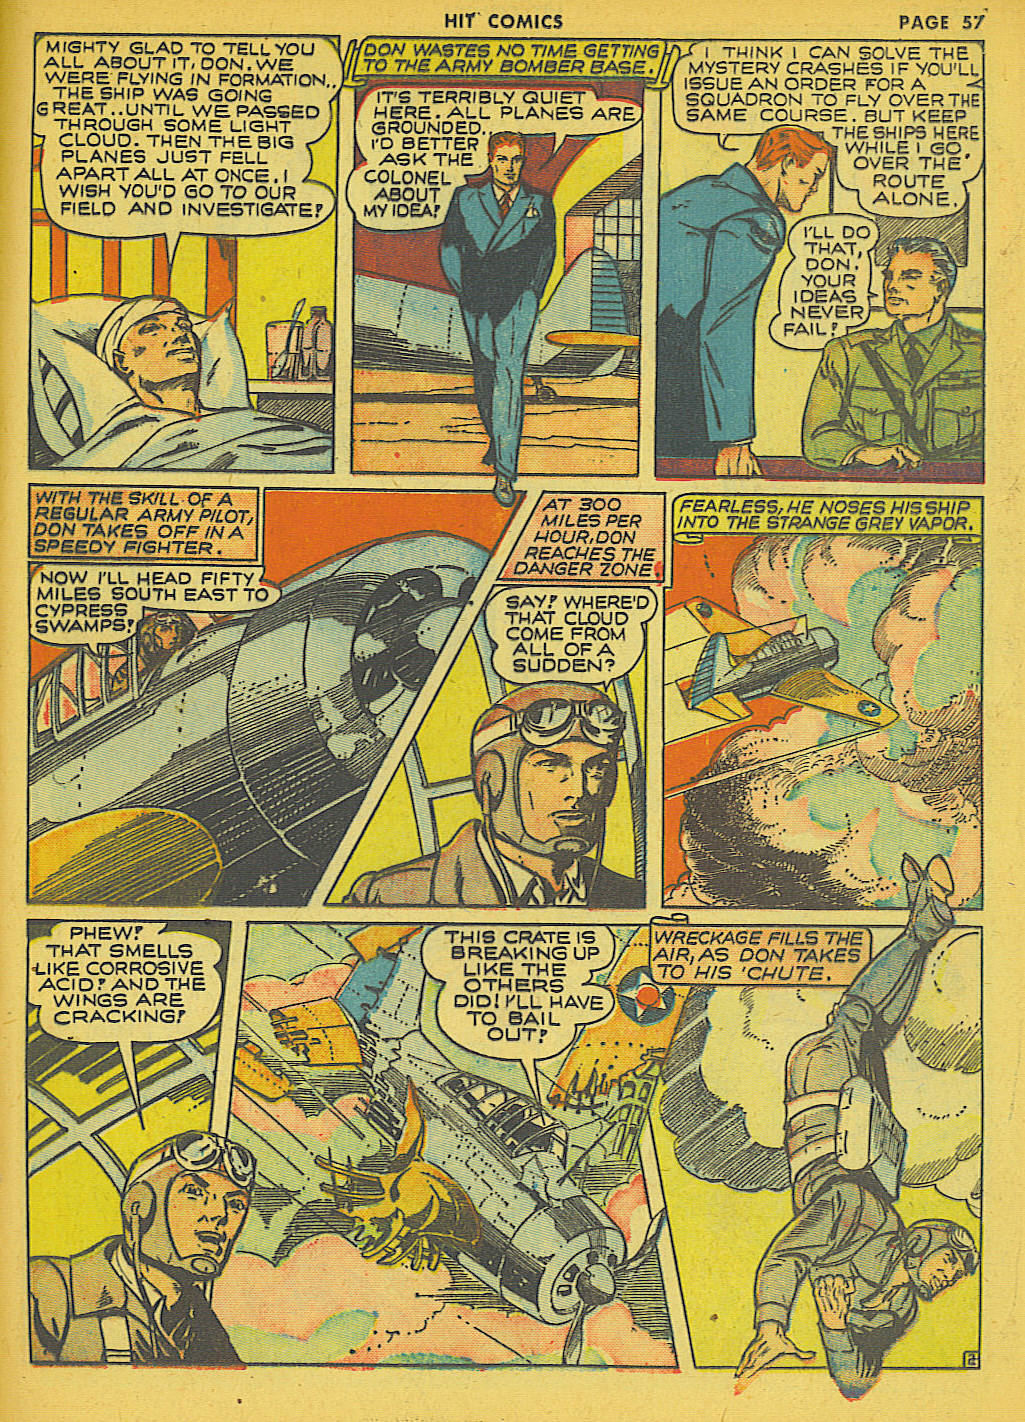 Read online Hit Comics comic -  Issue #21 - 59